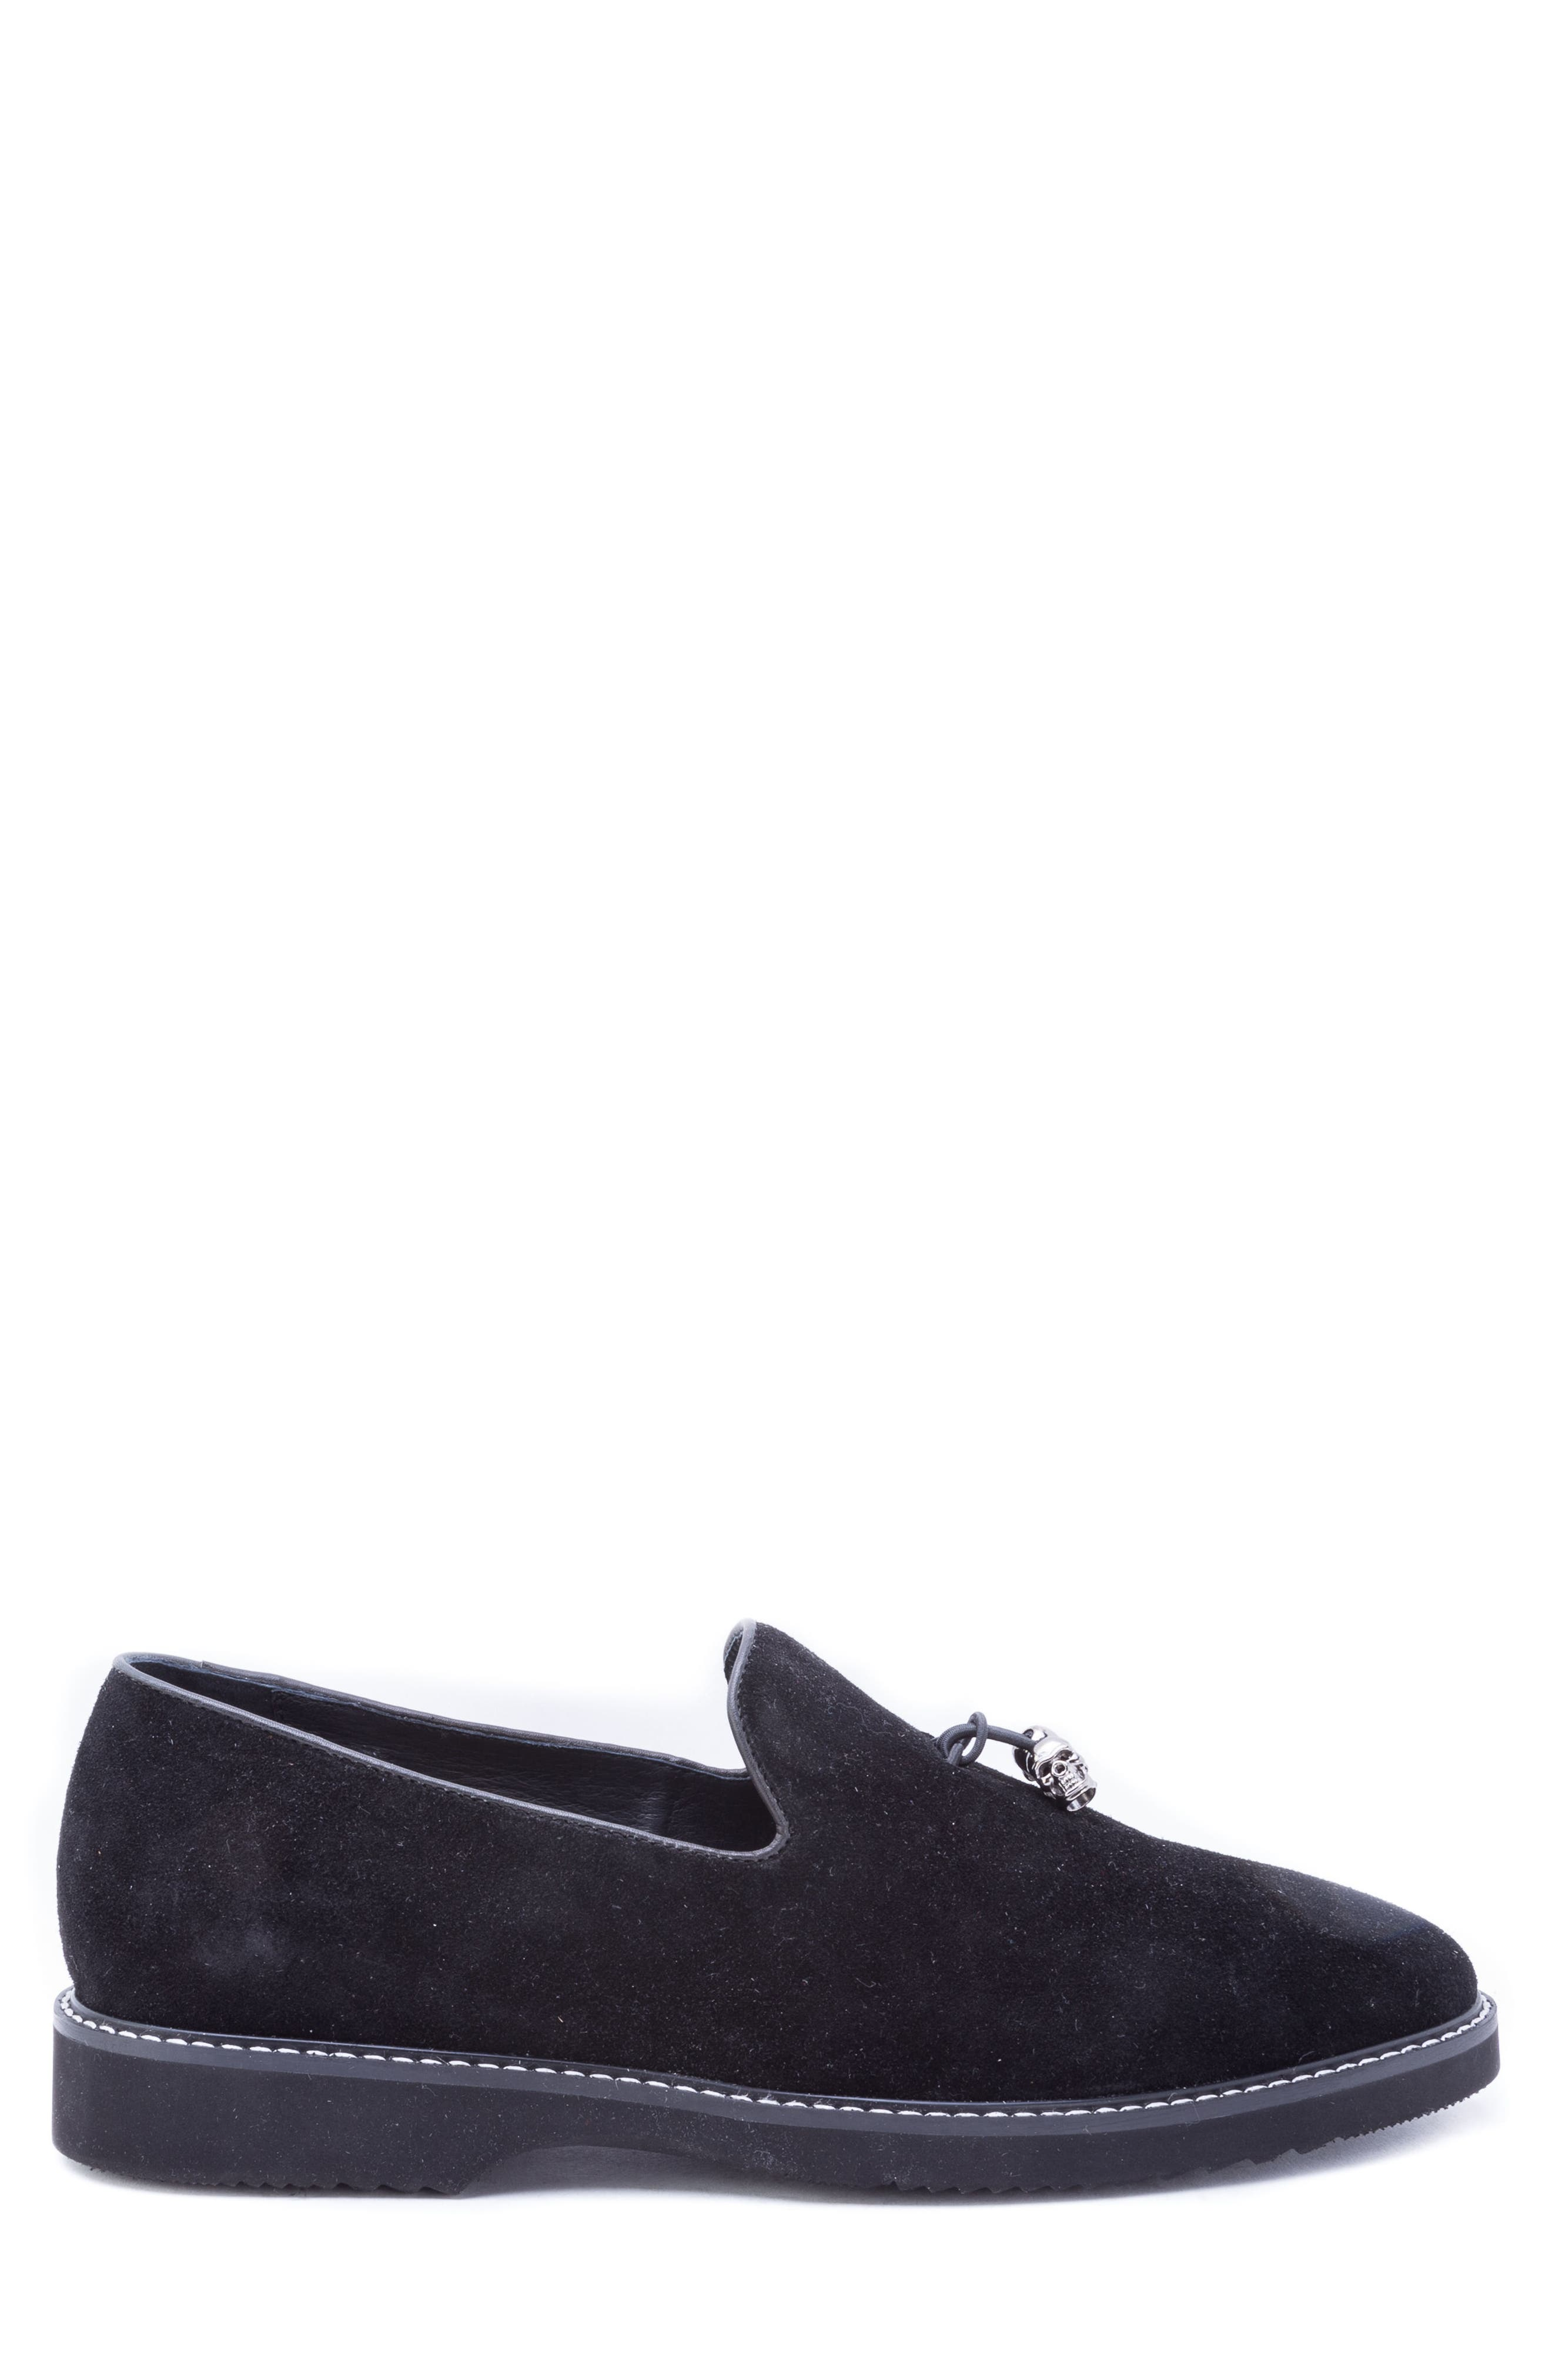 Badgley Mischka Heston Tassel Loafer,                             Alternate thumbnail 3, color,                             BLACK SUEDE